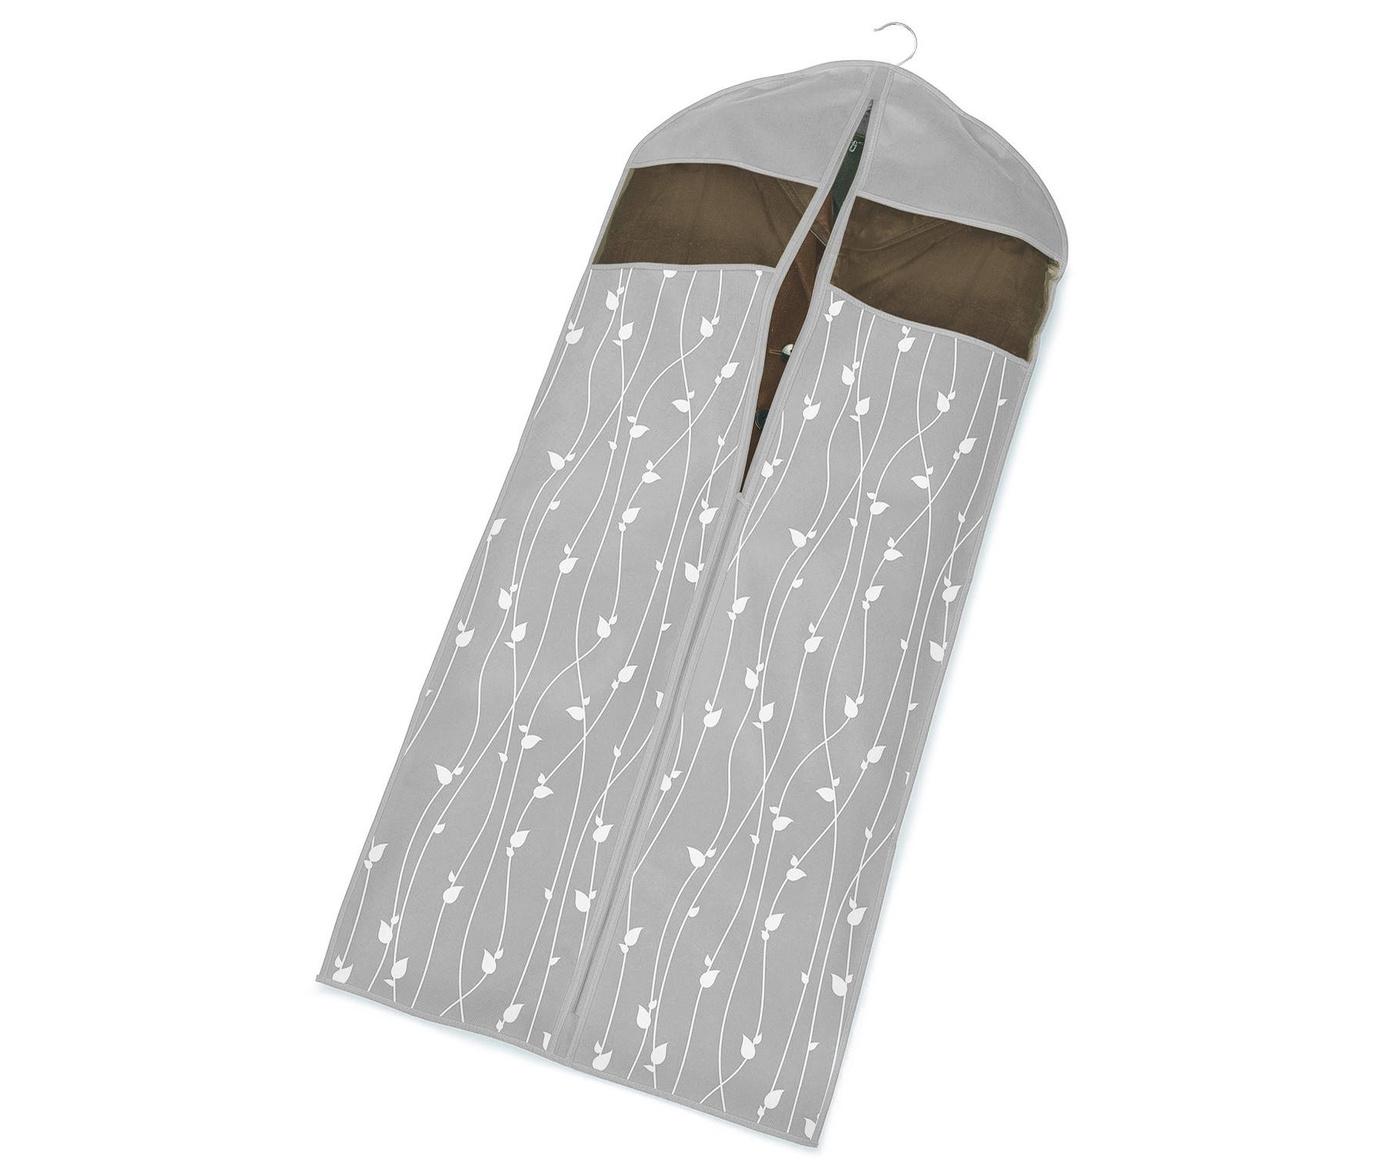 Husa pentru haine Leaves Grey 60x137 cm